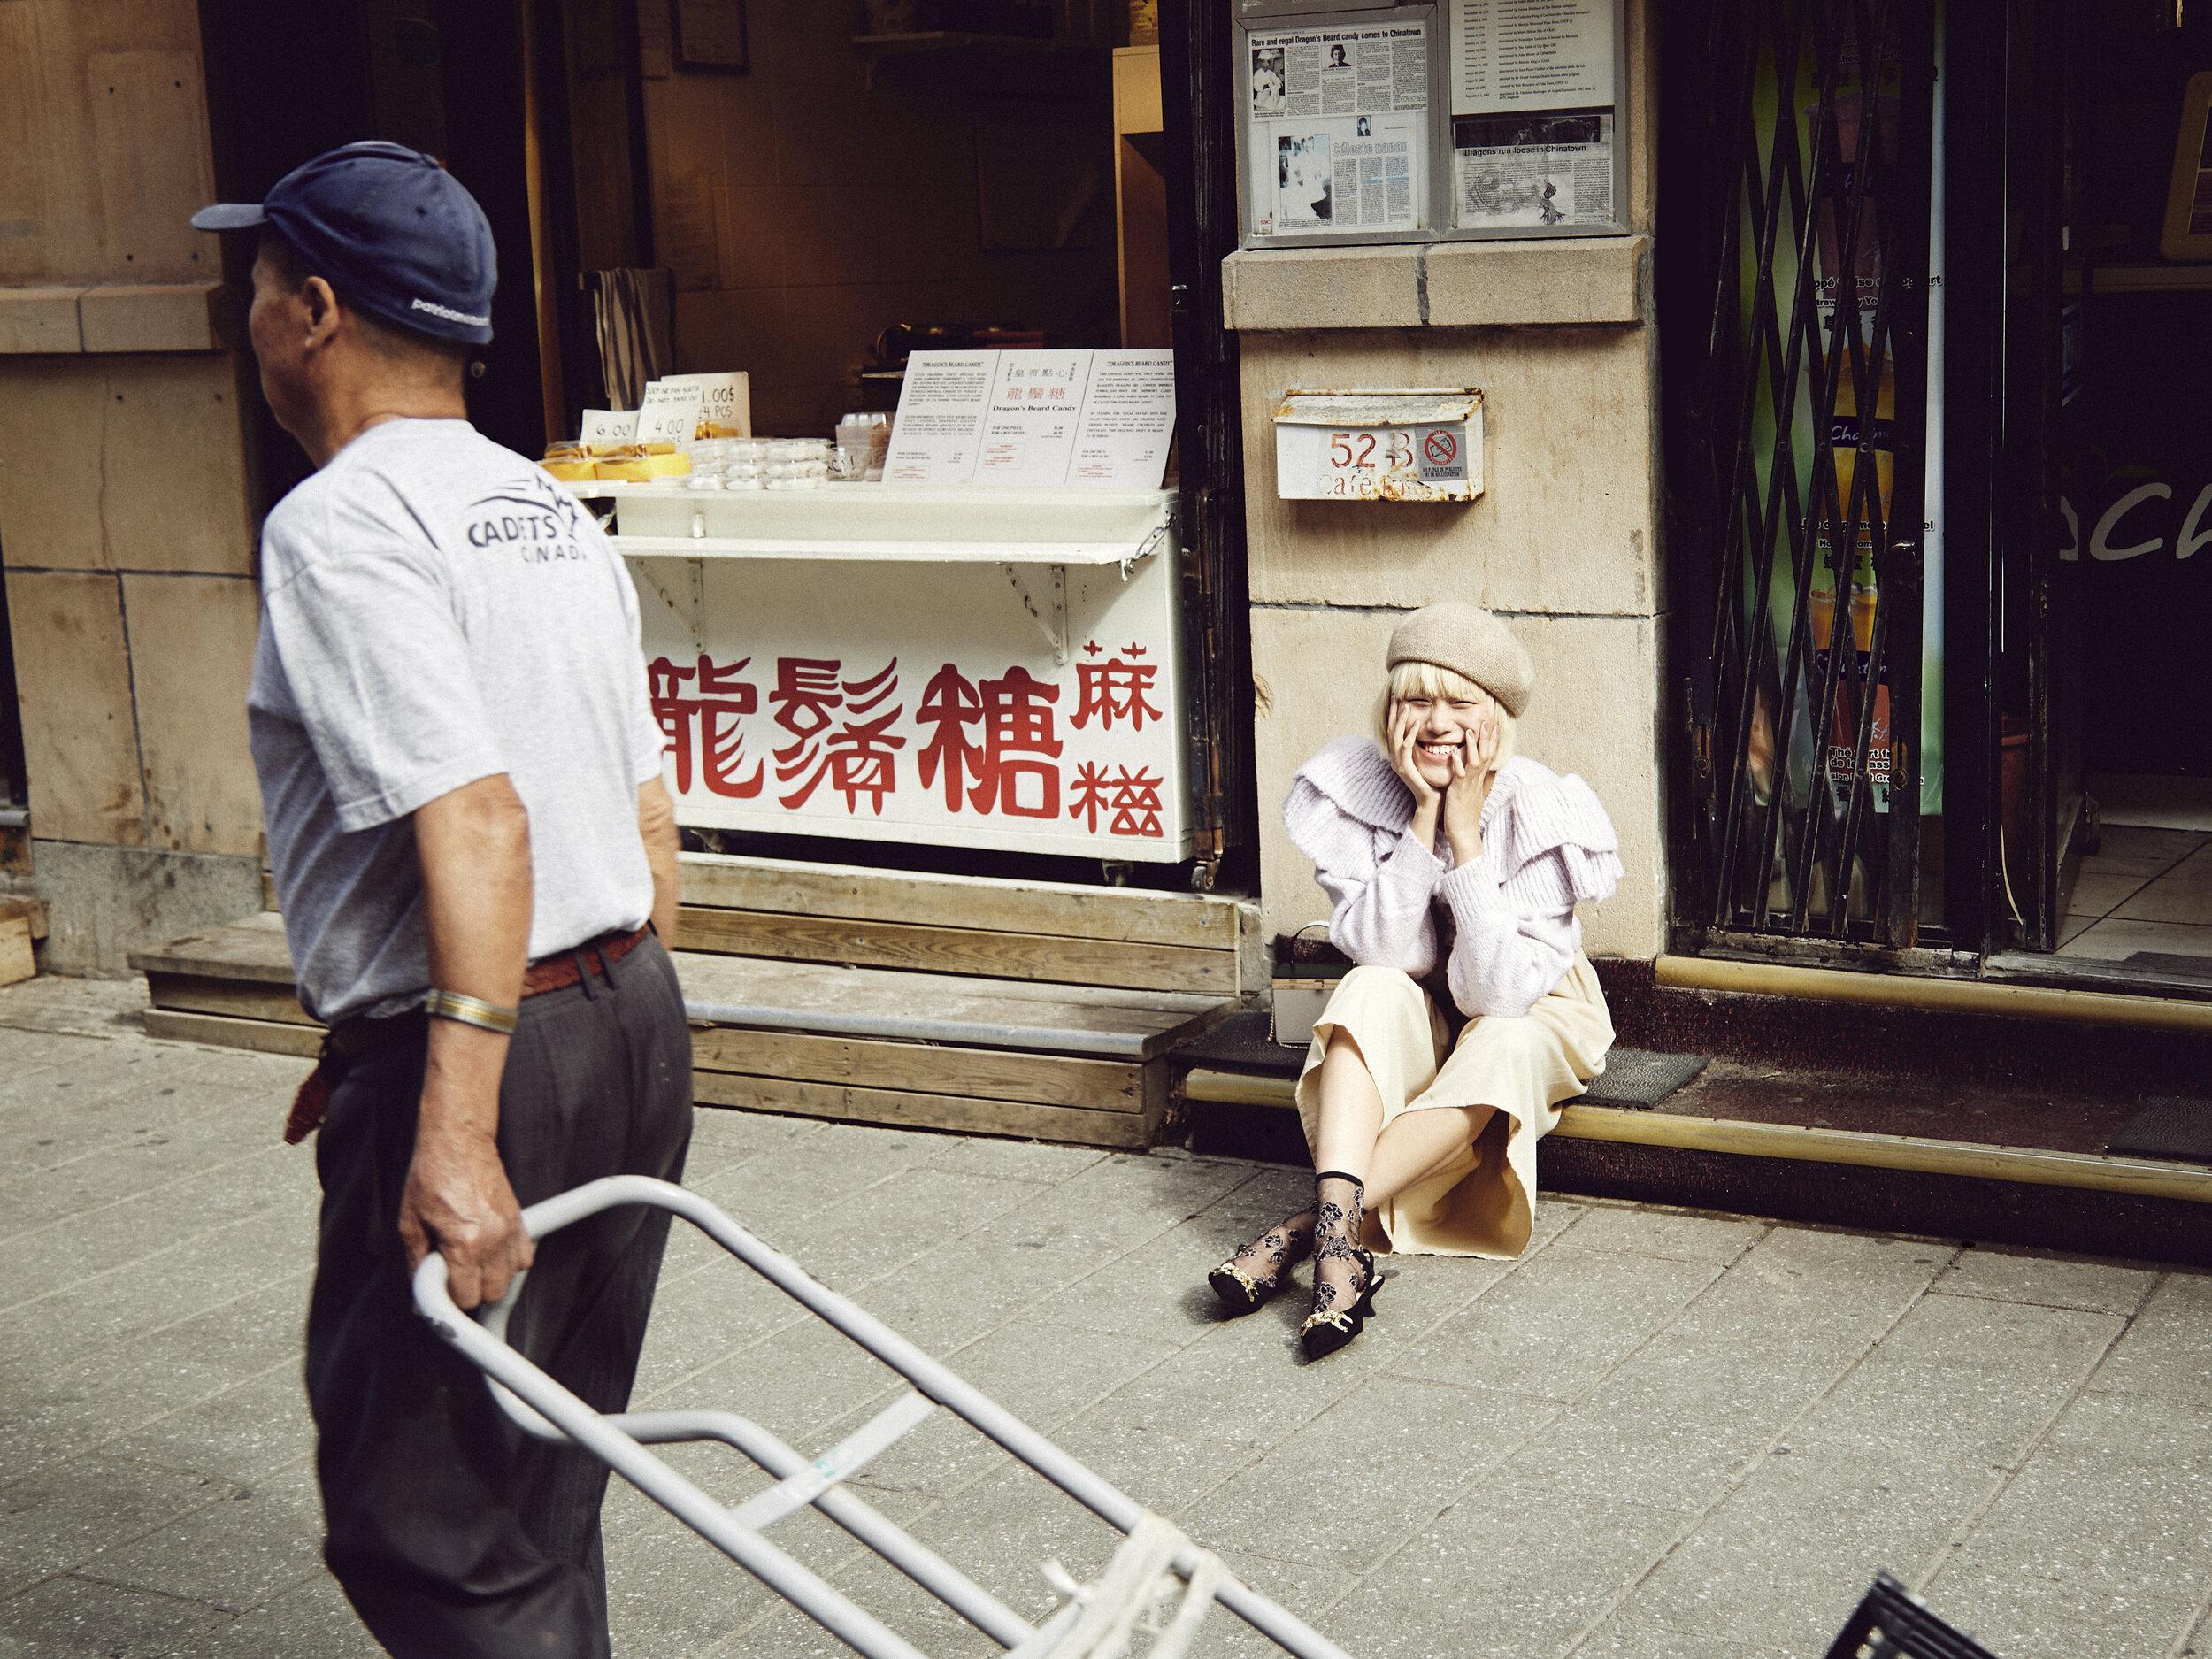 LGR_Zhang_2019_1827.jpg